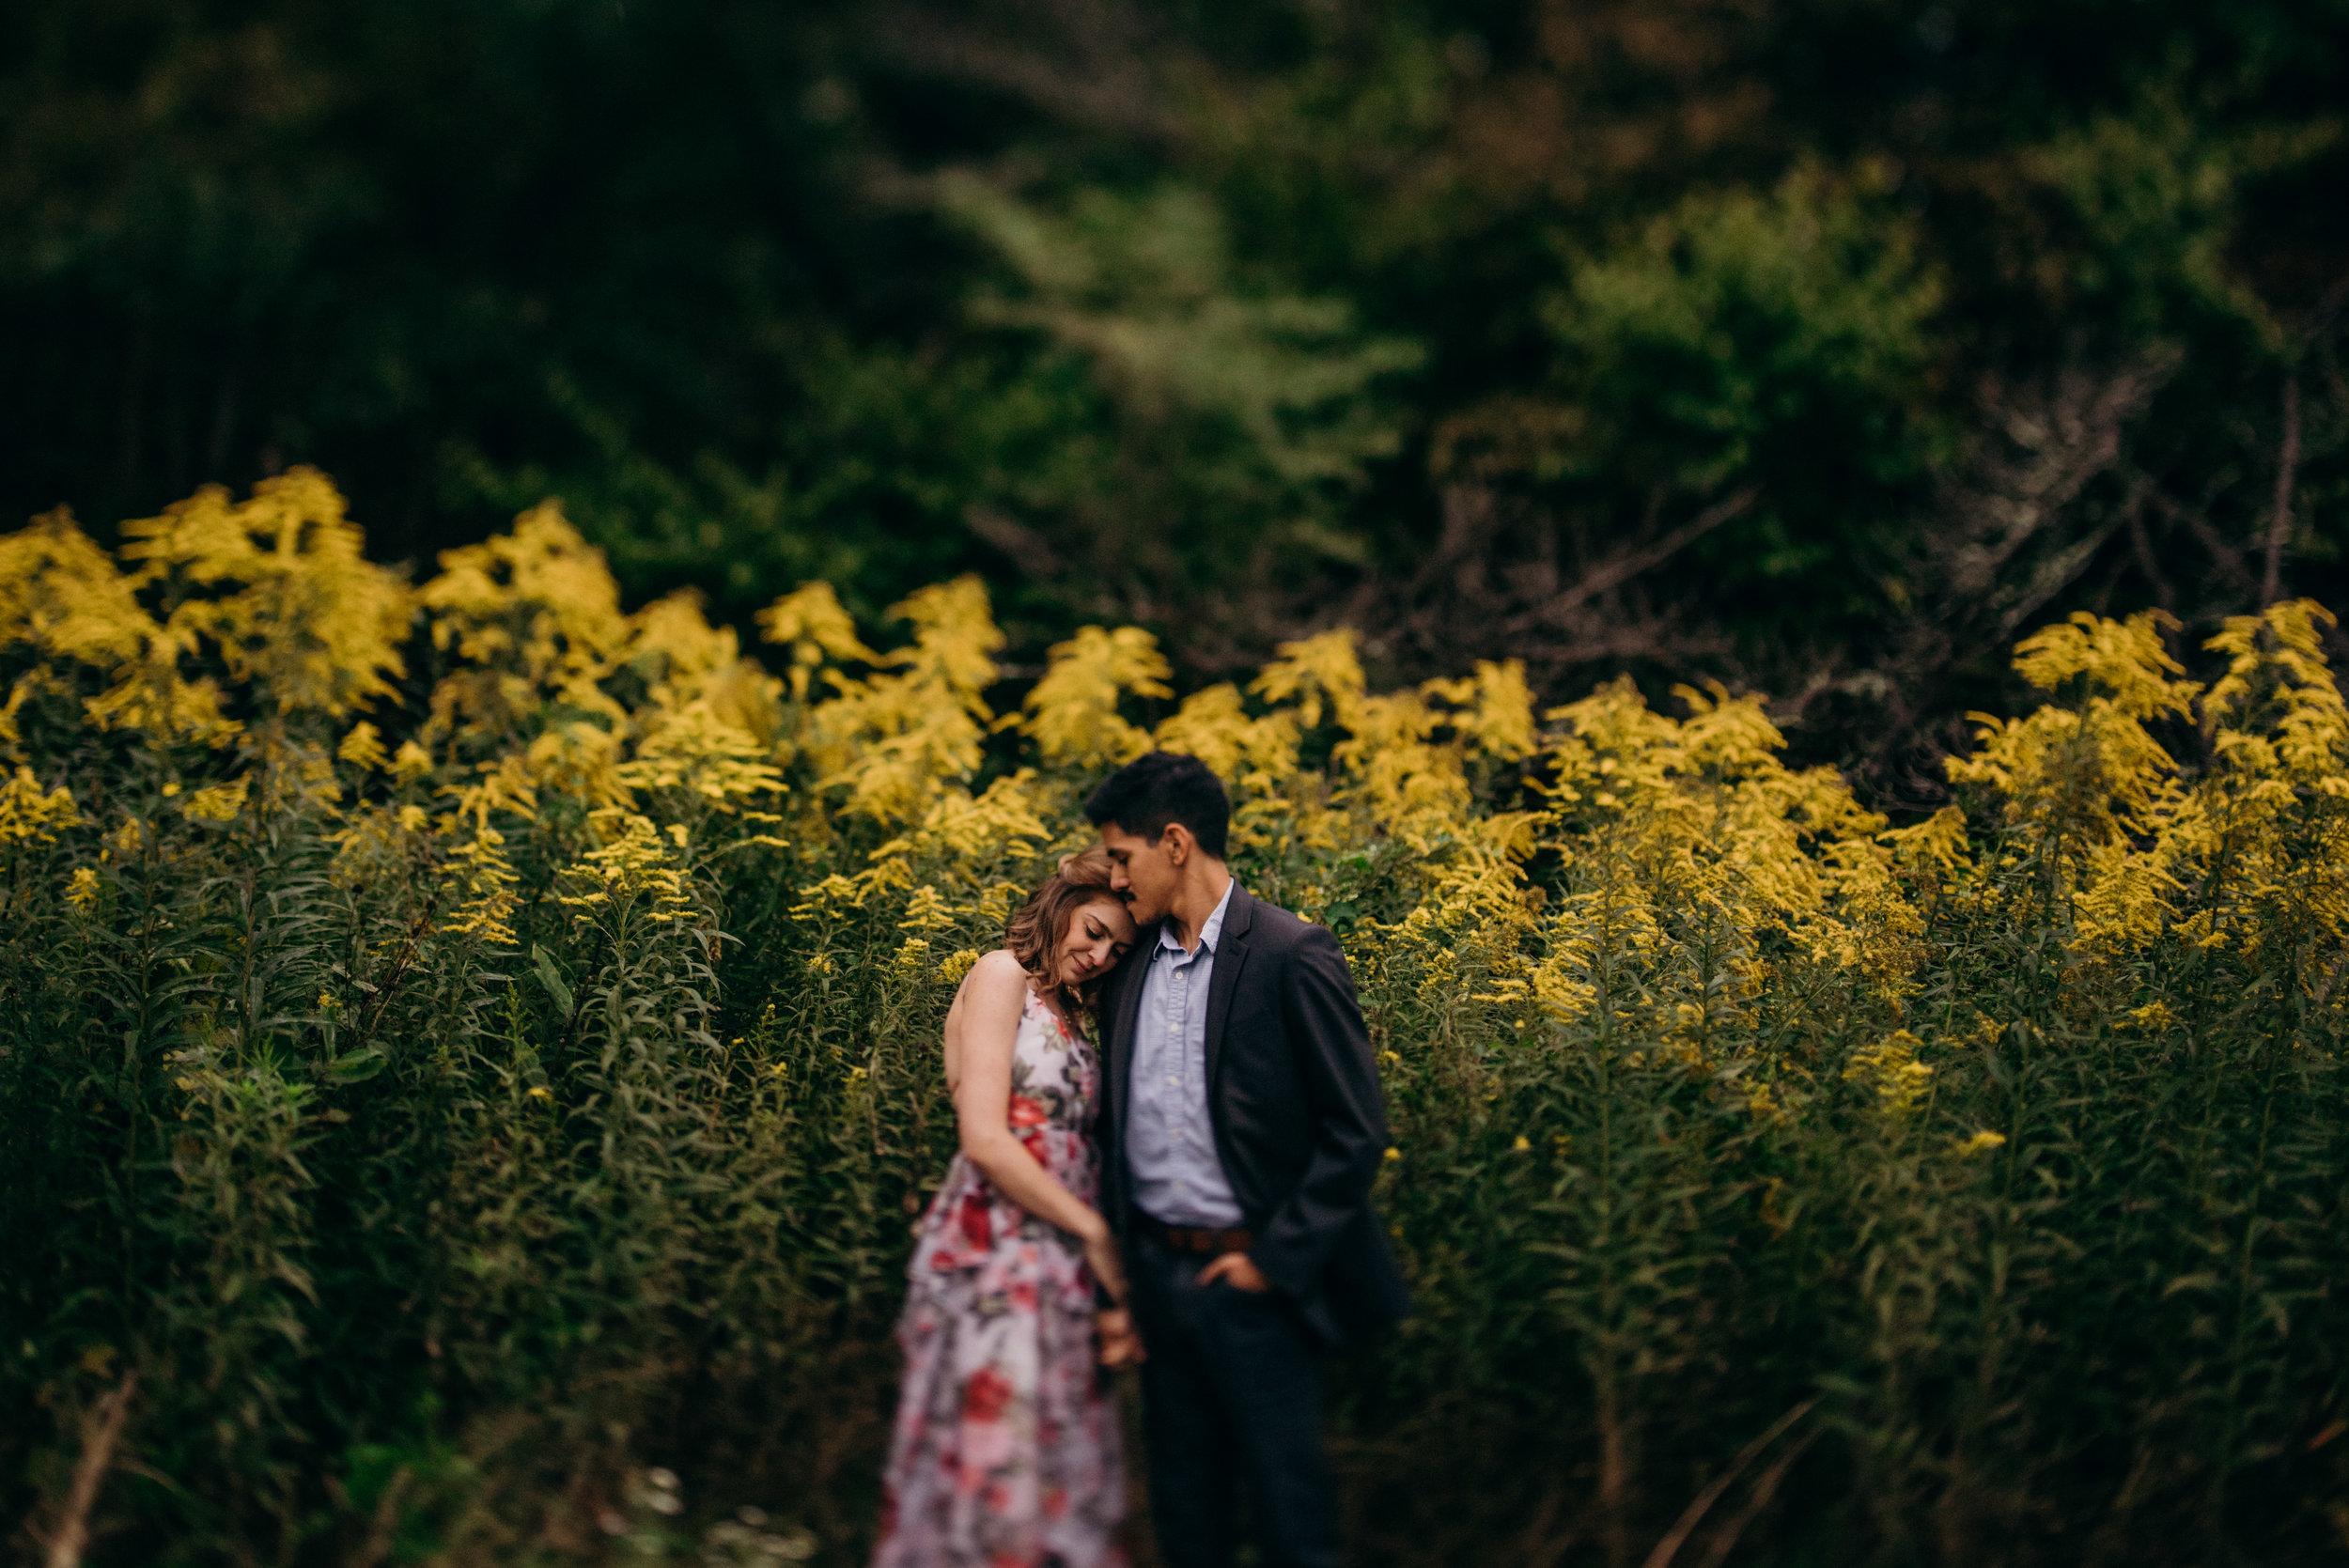 alvaro-sasha-skyline-drive-engagement-session-virginia-wedding-photographer-lindsey-paradiso-8671.jpg